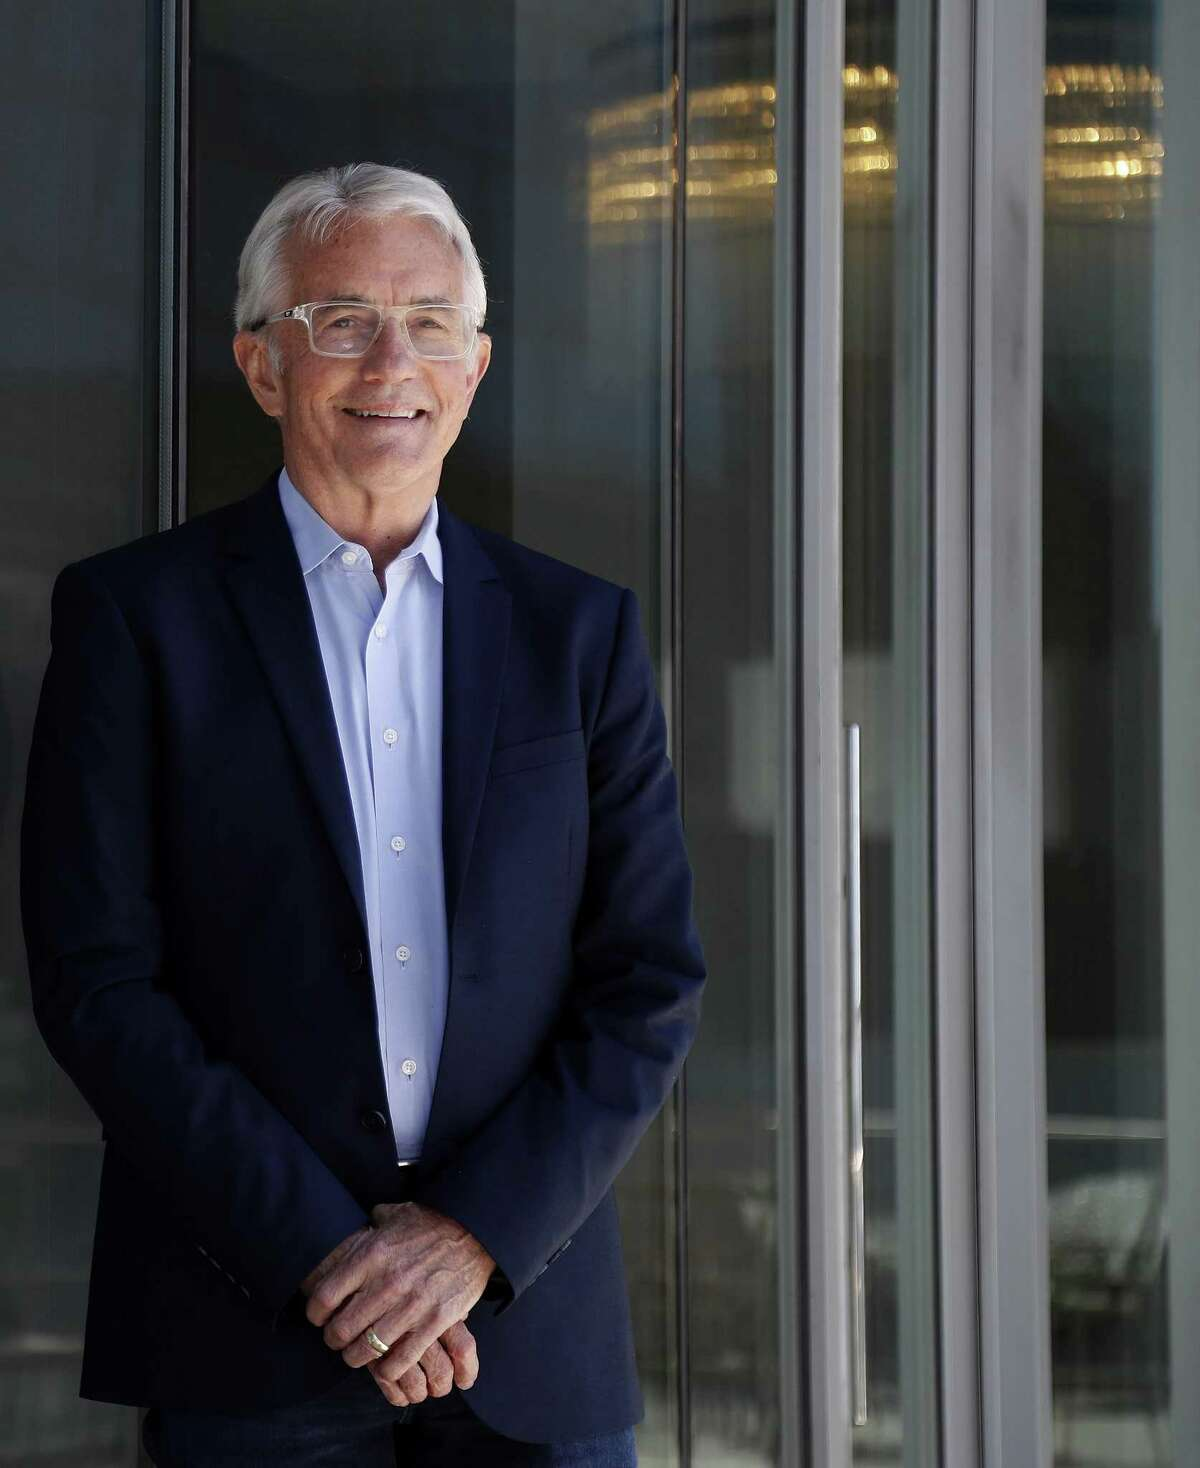 Houston Exponential's new Executive Director Russ Capper, Monday, April 16, 2018, in Houston. ( Karen Warren / Houston Chronicle )